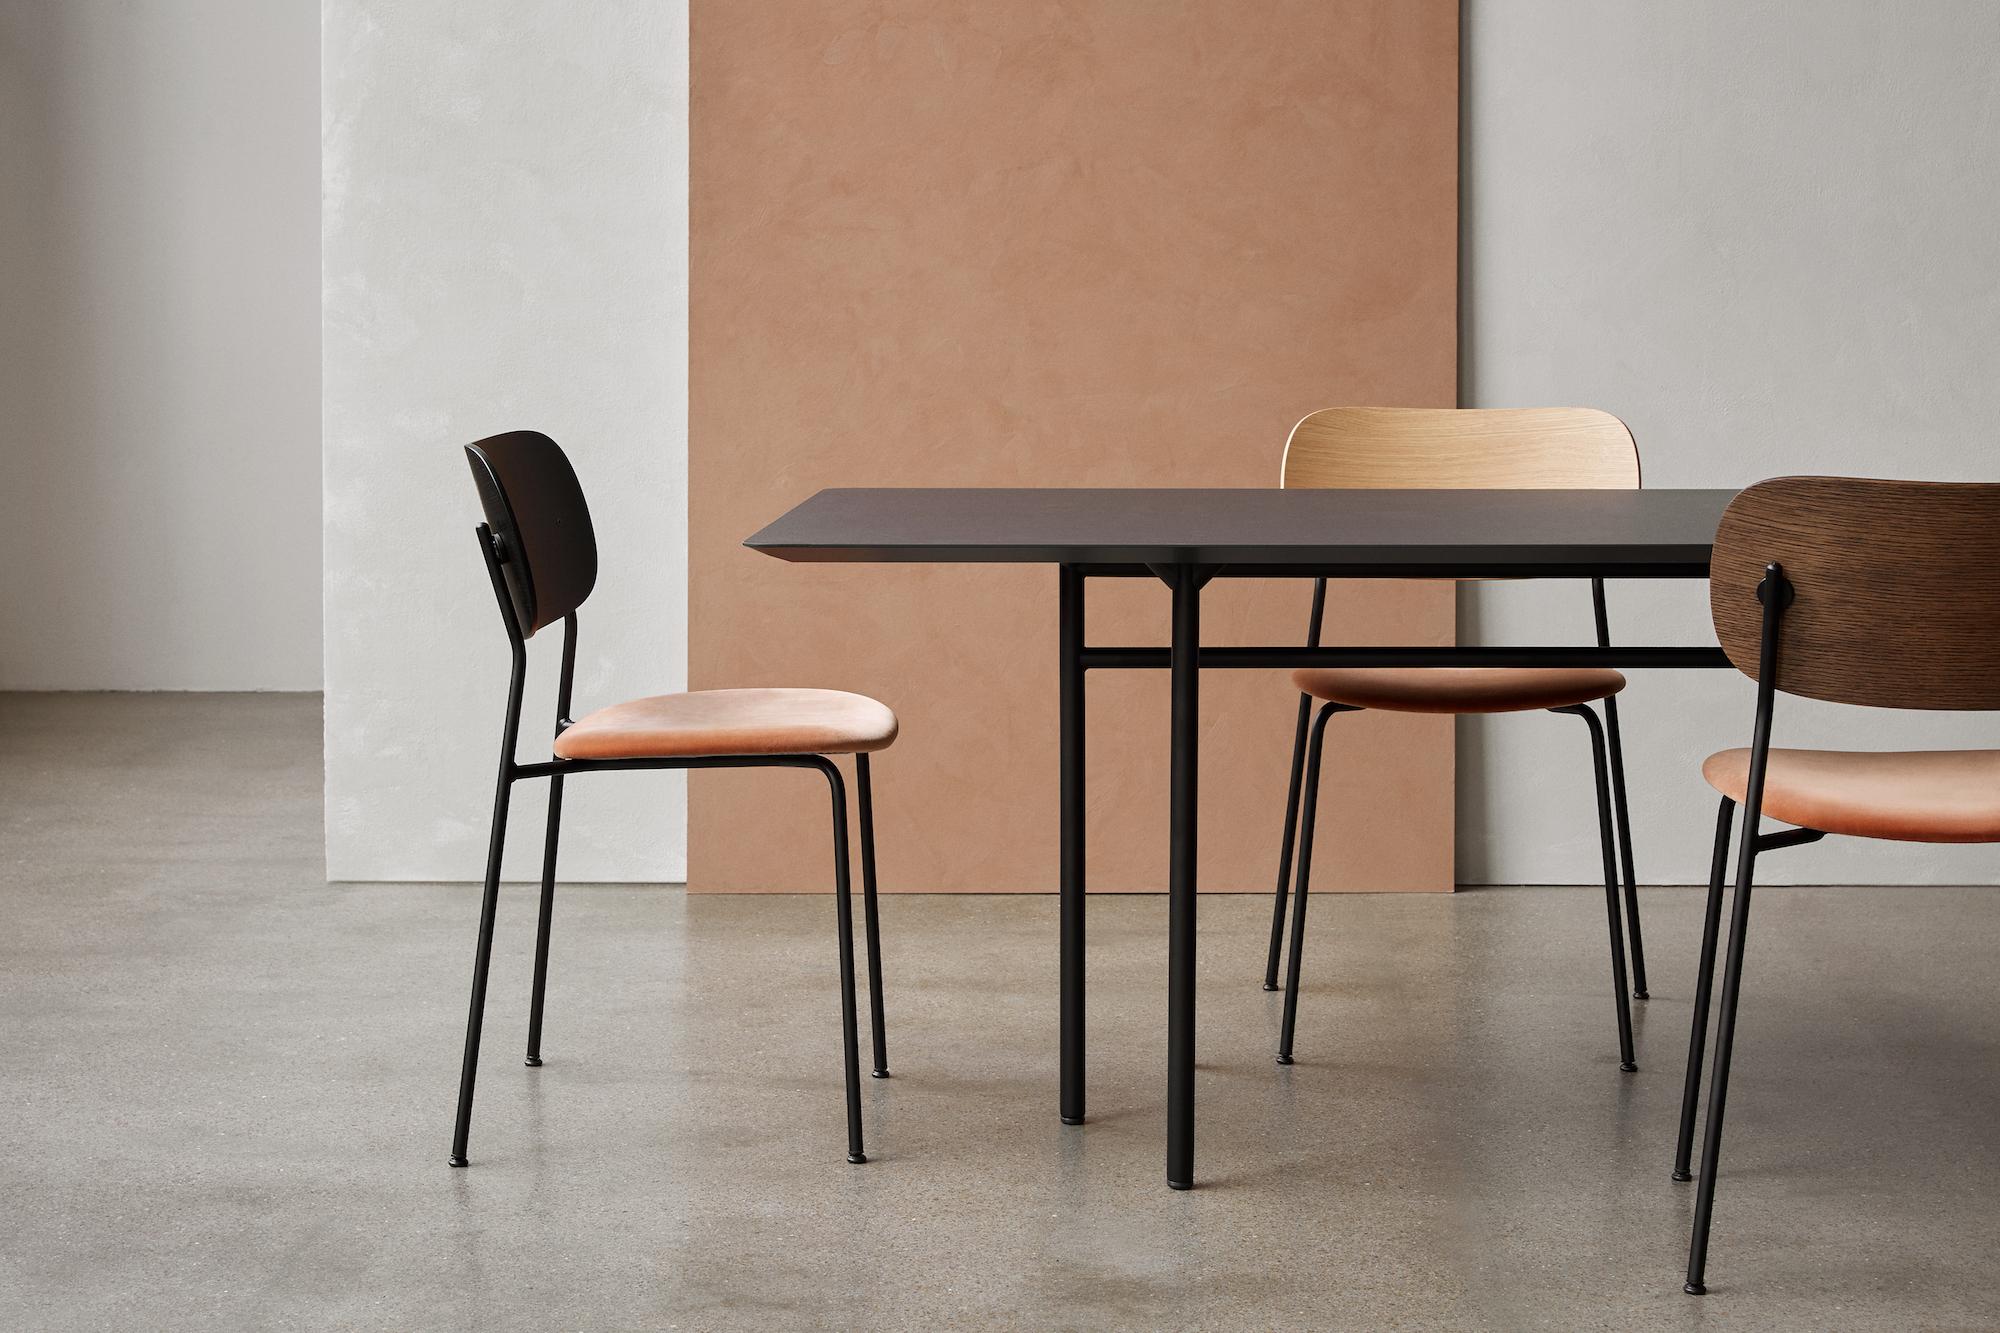 Co Chair The Lab Menu, modern furniture, chair, scandinavian design, scandinavian home 6.jpg